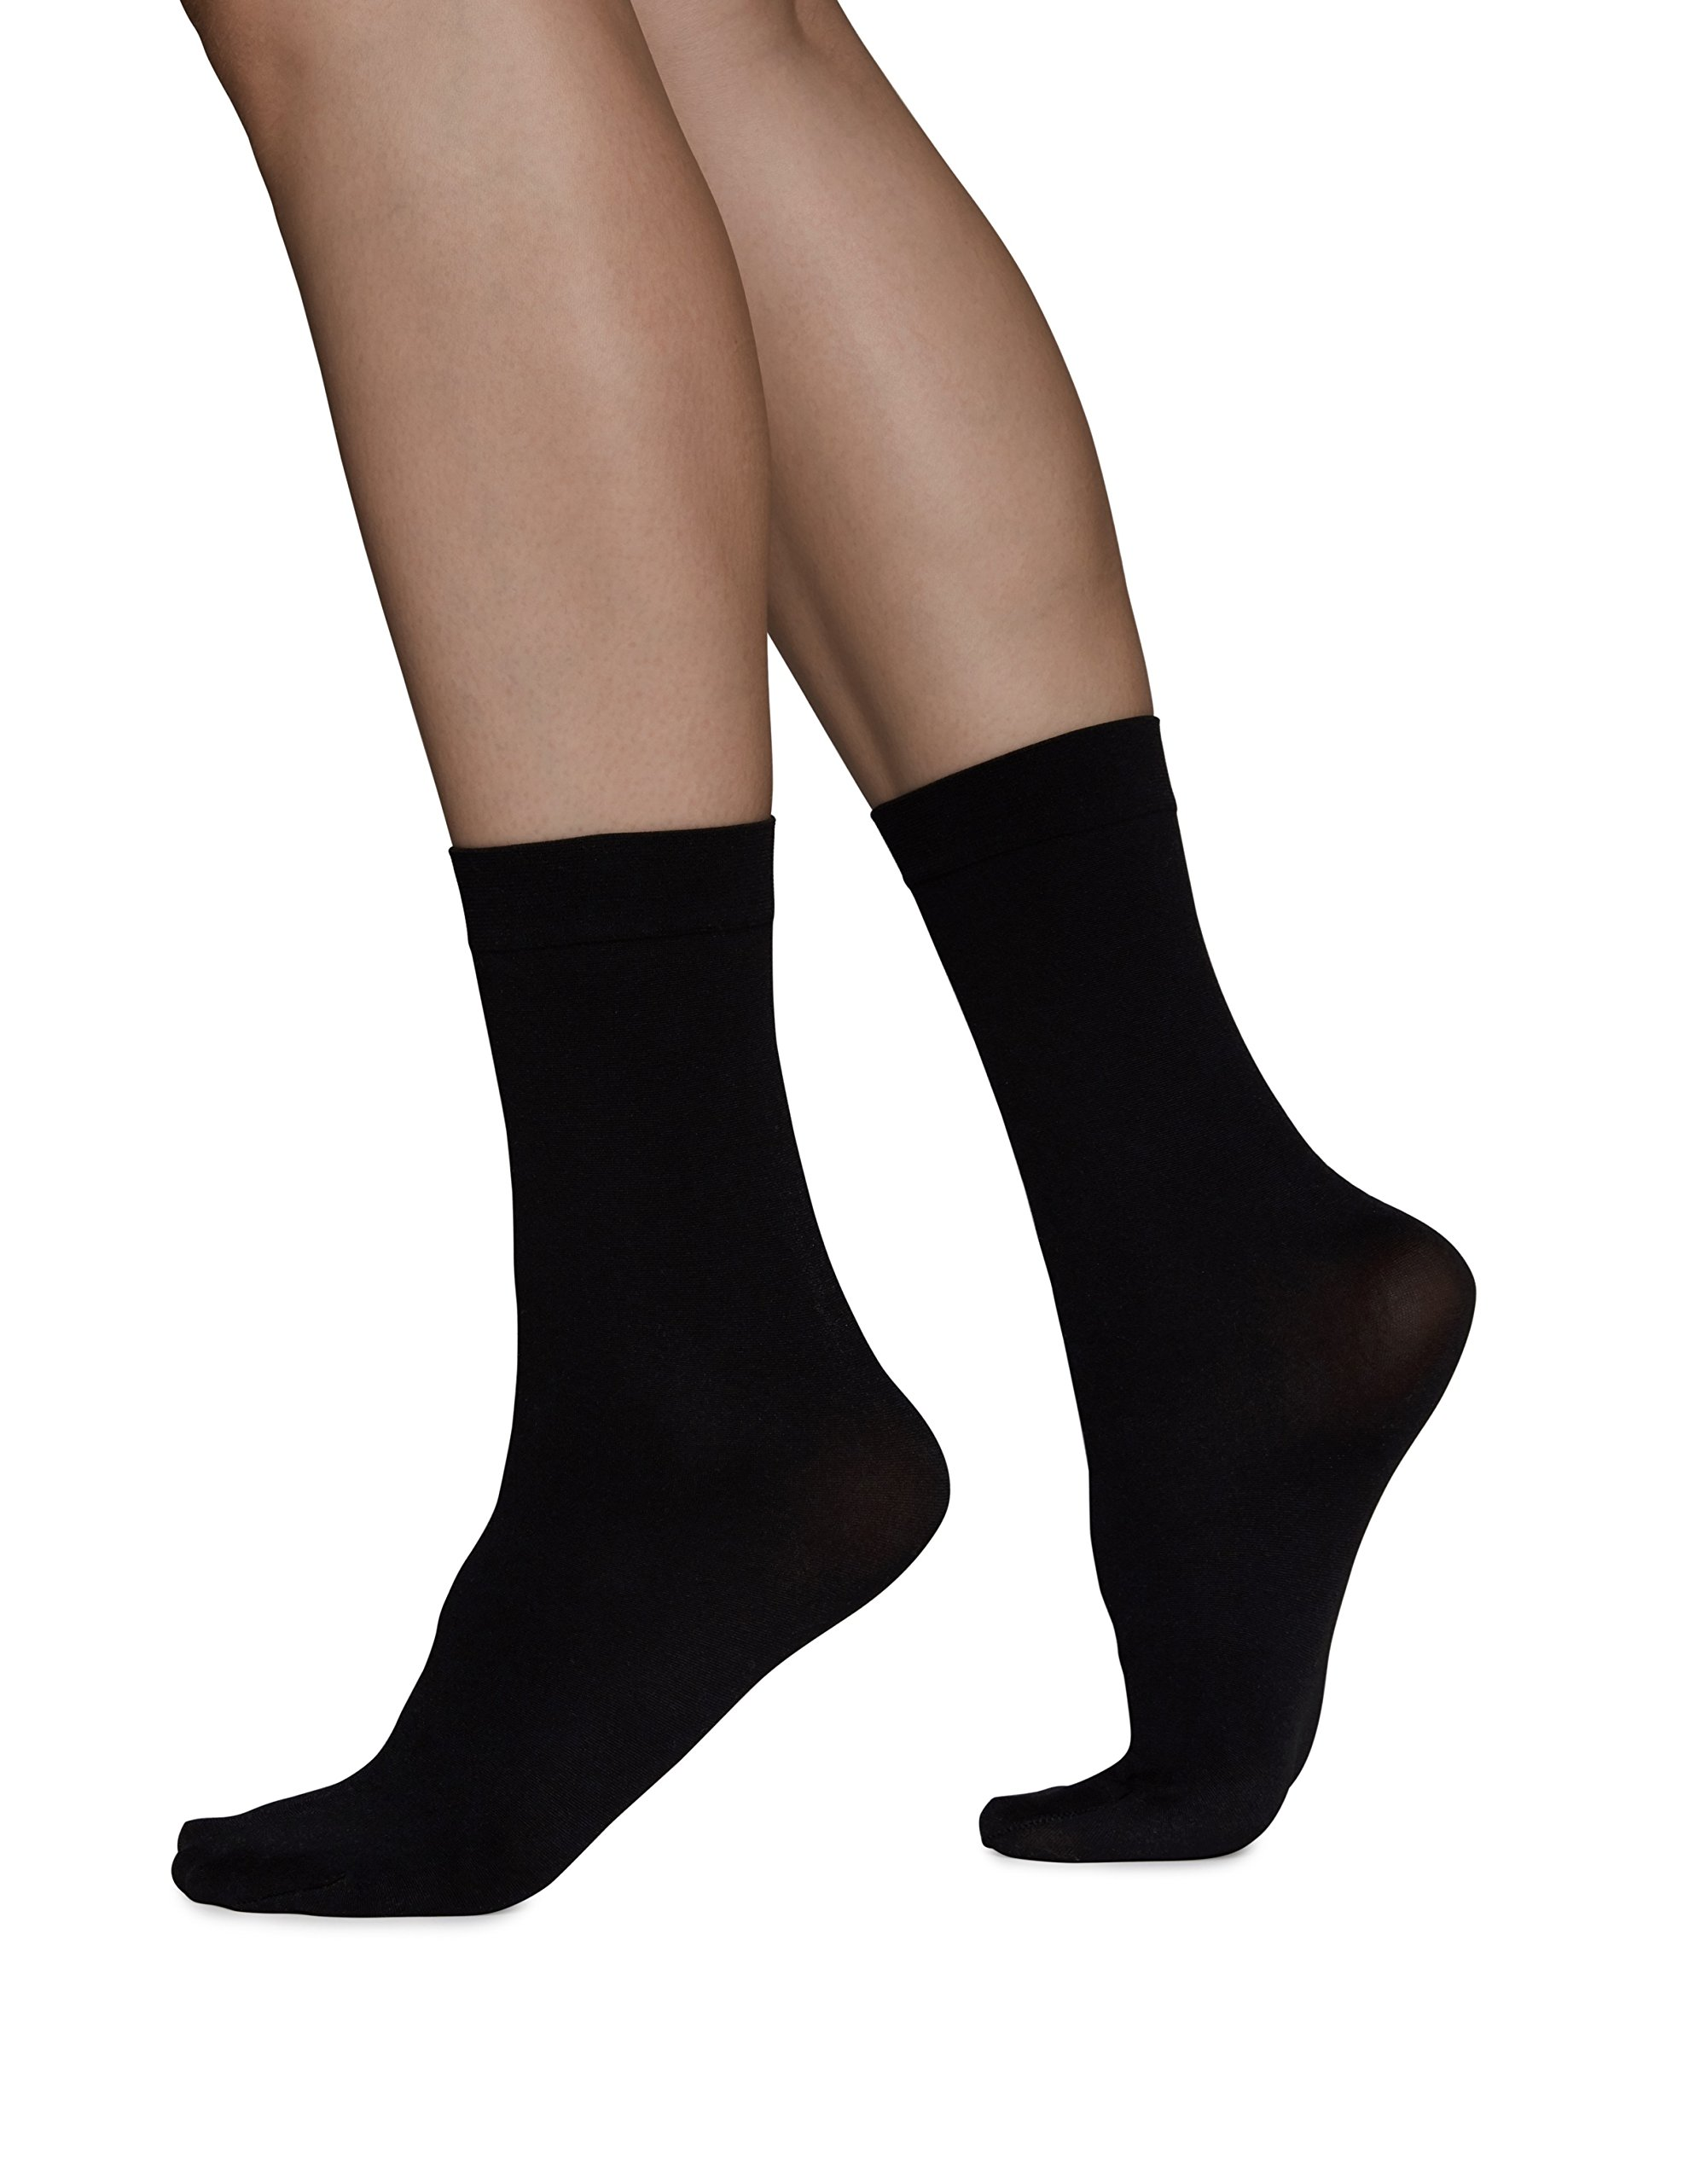 Swedish Stockings INGRID ANKLE Black Socks - 60 Denier Medium Coverage for Women with Elastic Top - ONE SIZE